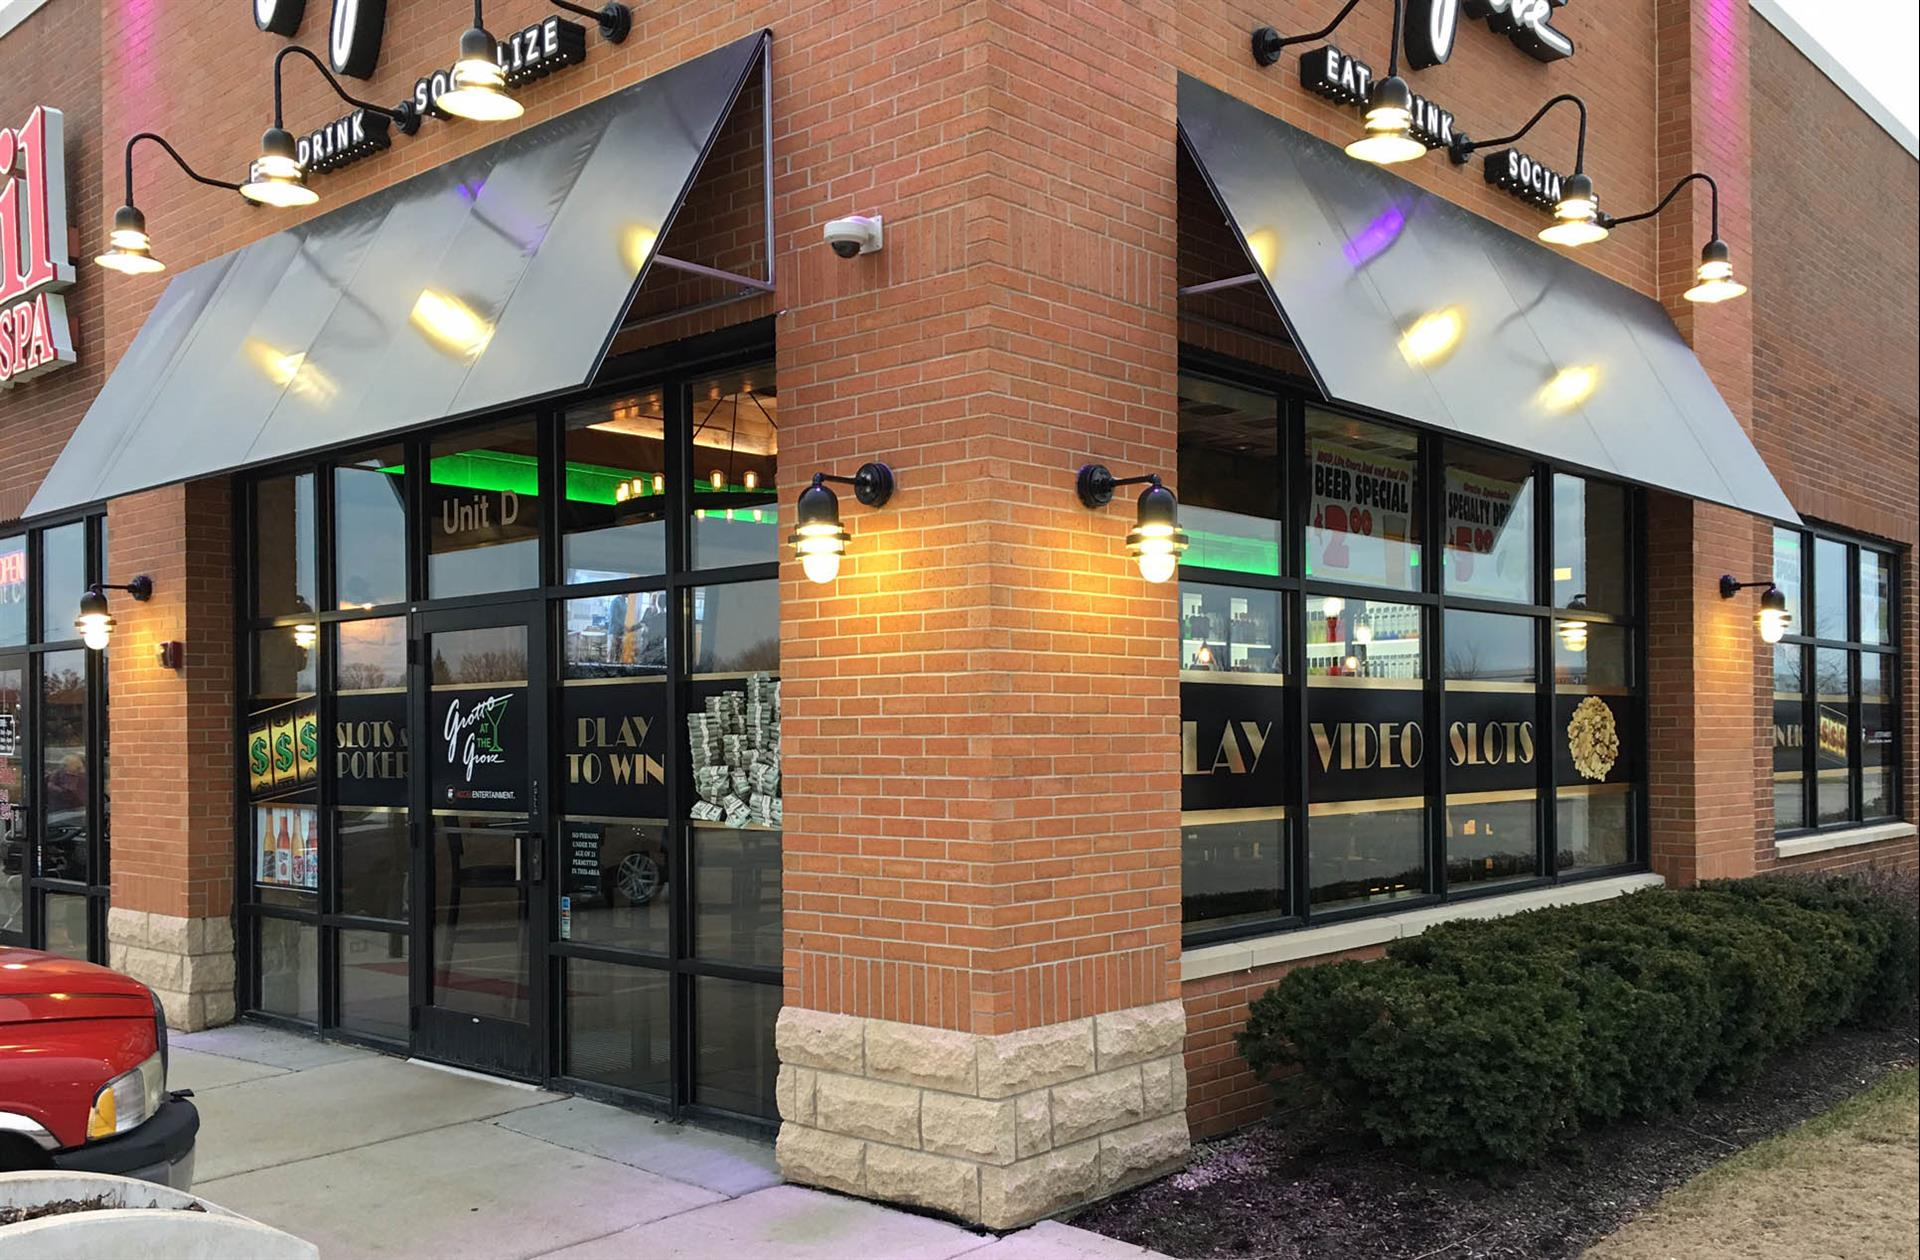 Restaurant Storefront Graphics